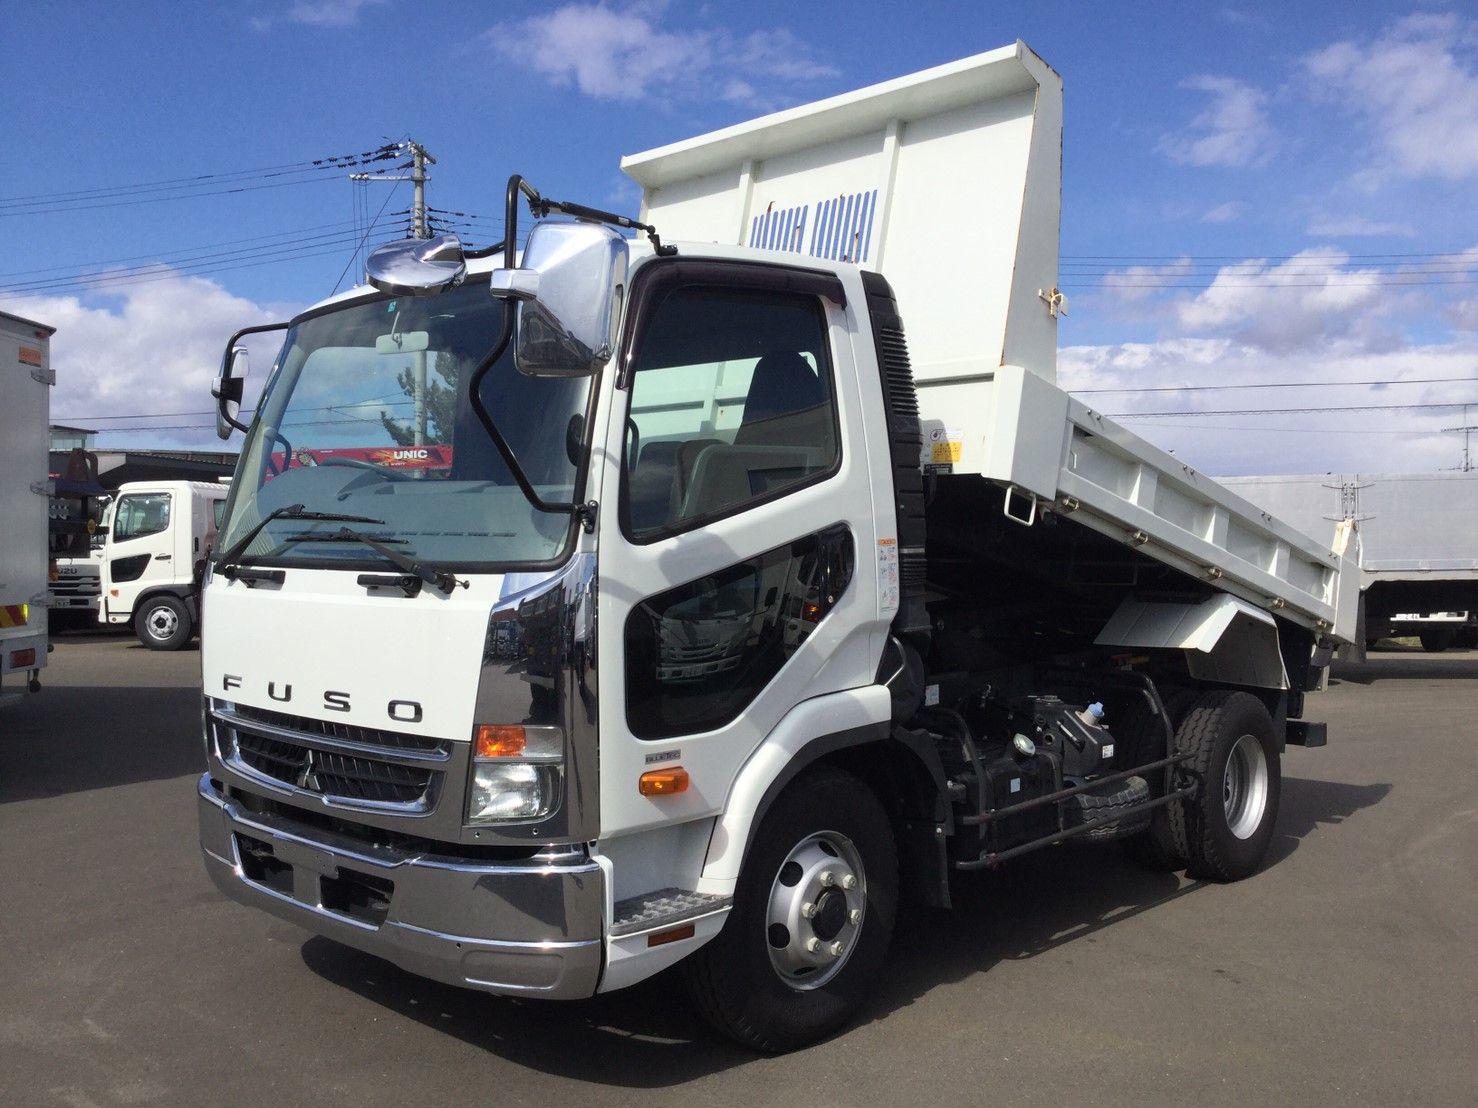 2016 Mitsubishi Fuso Fighter 4 Ton Dump Truck In 2020 Trucks Used Trucks For Sale Mitsubishi